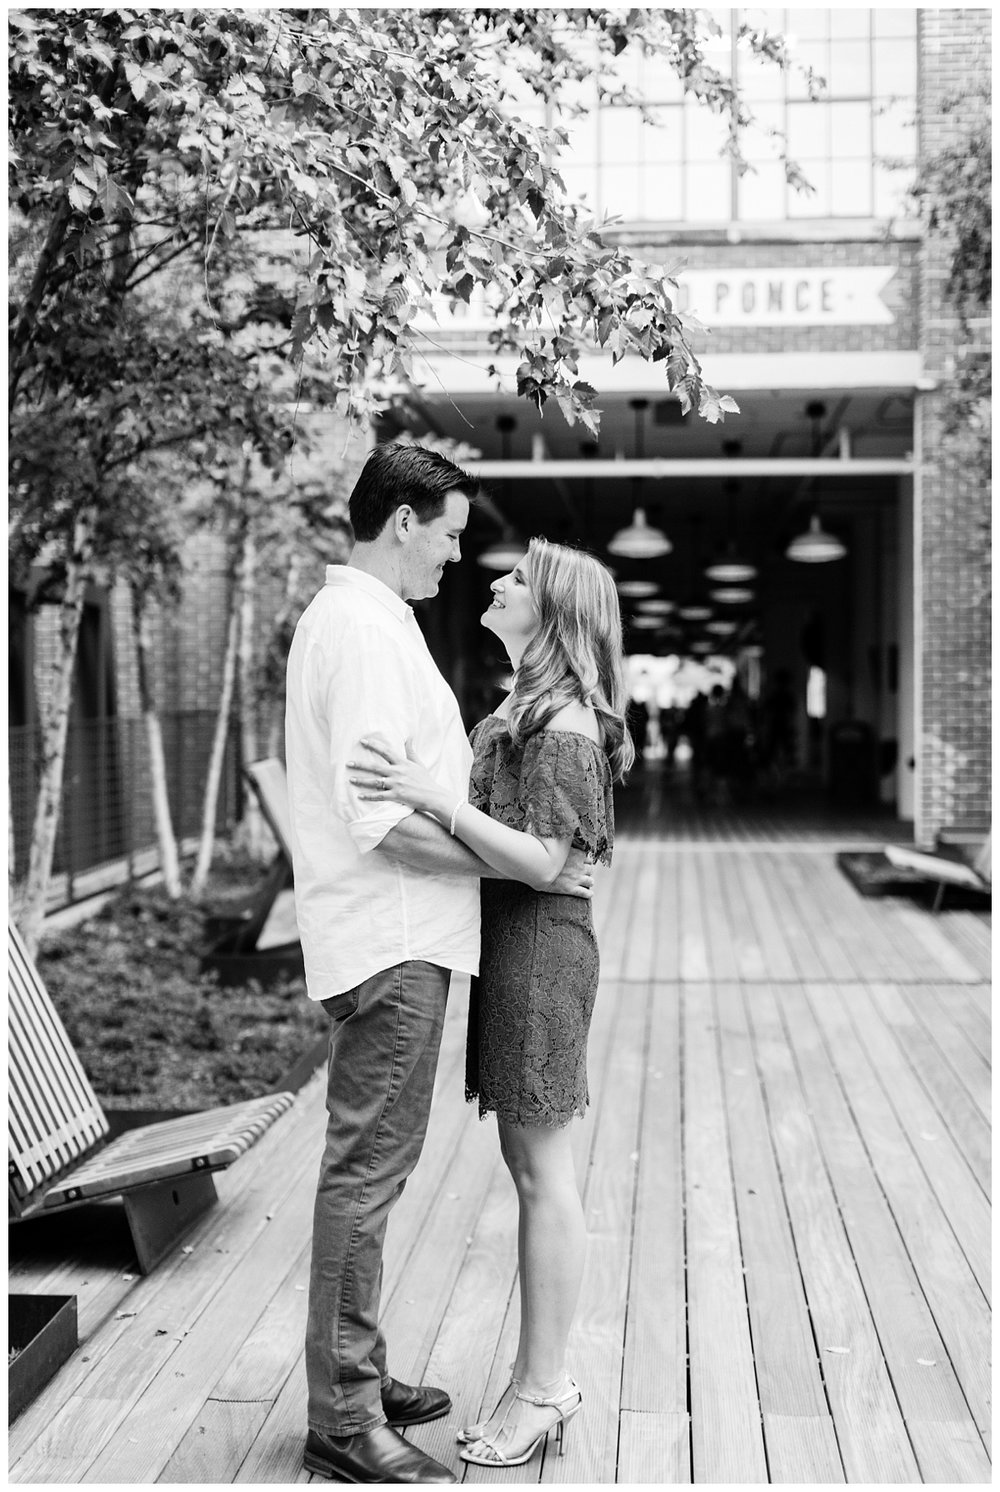 Engagement Pictures_KIm and Hamish_Abby Breaux Photography_Atlanta_Ponce City Market_Jackson Street Bridge_0047.jpg